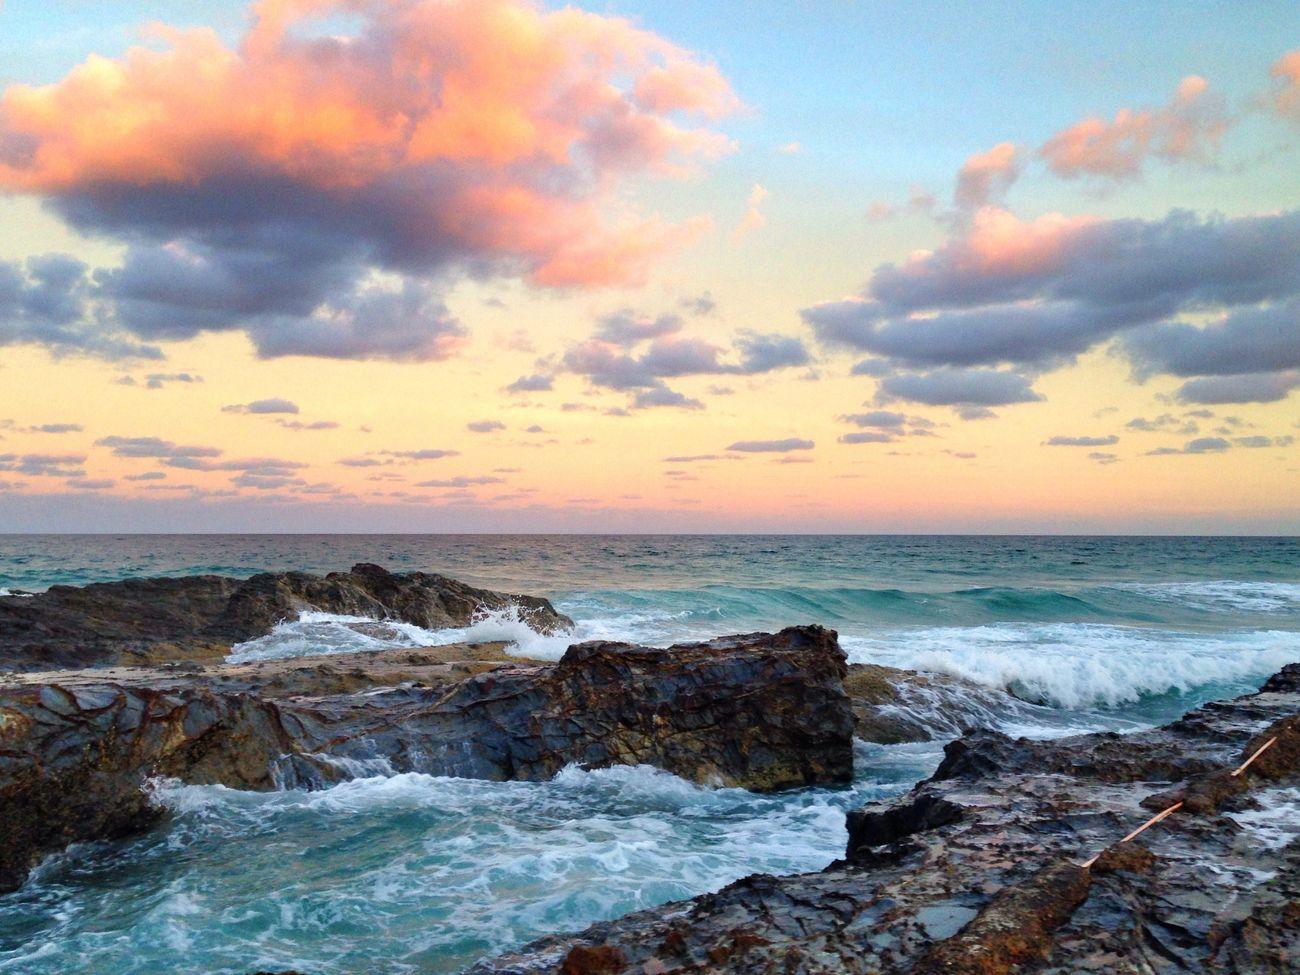 Beauty In Nature Rock - Object Coastline Sunset Beach Australia Gold Coast Beachphotography Queensland Wave Ocean Sky Cloud - Sky